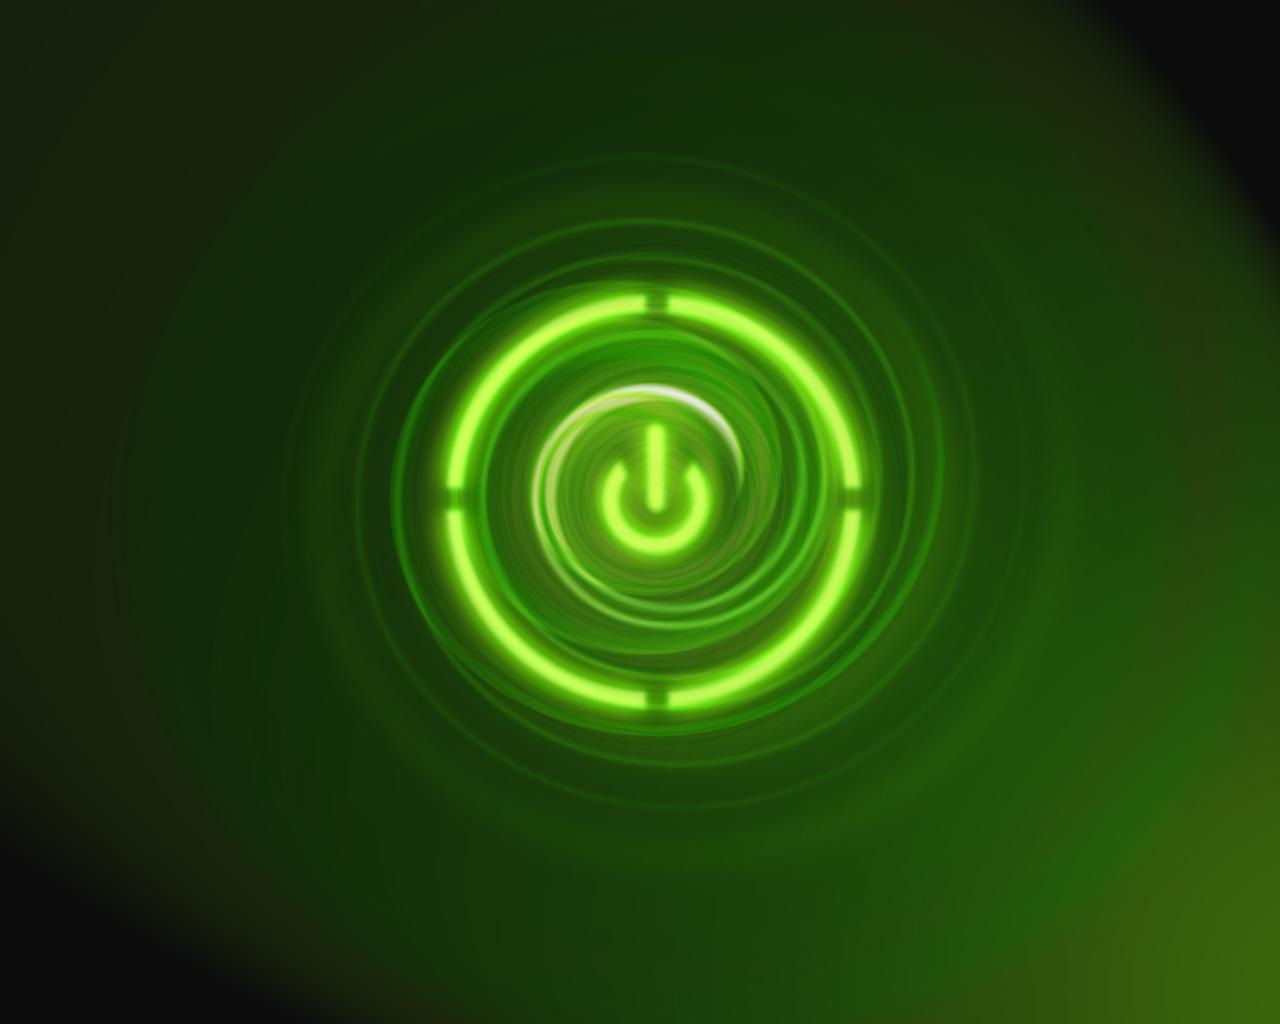 Xbox 360 wallpaper by nemethigaborXbox Wallpaper